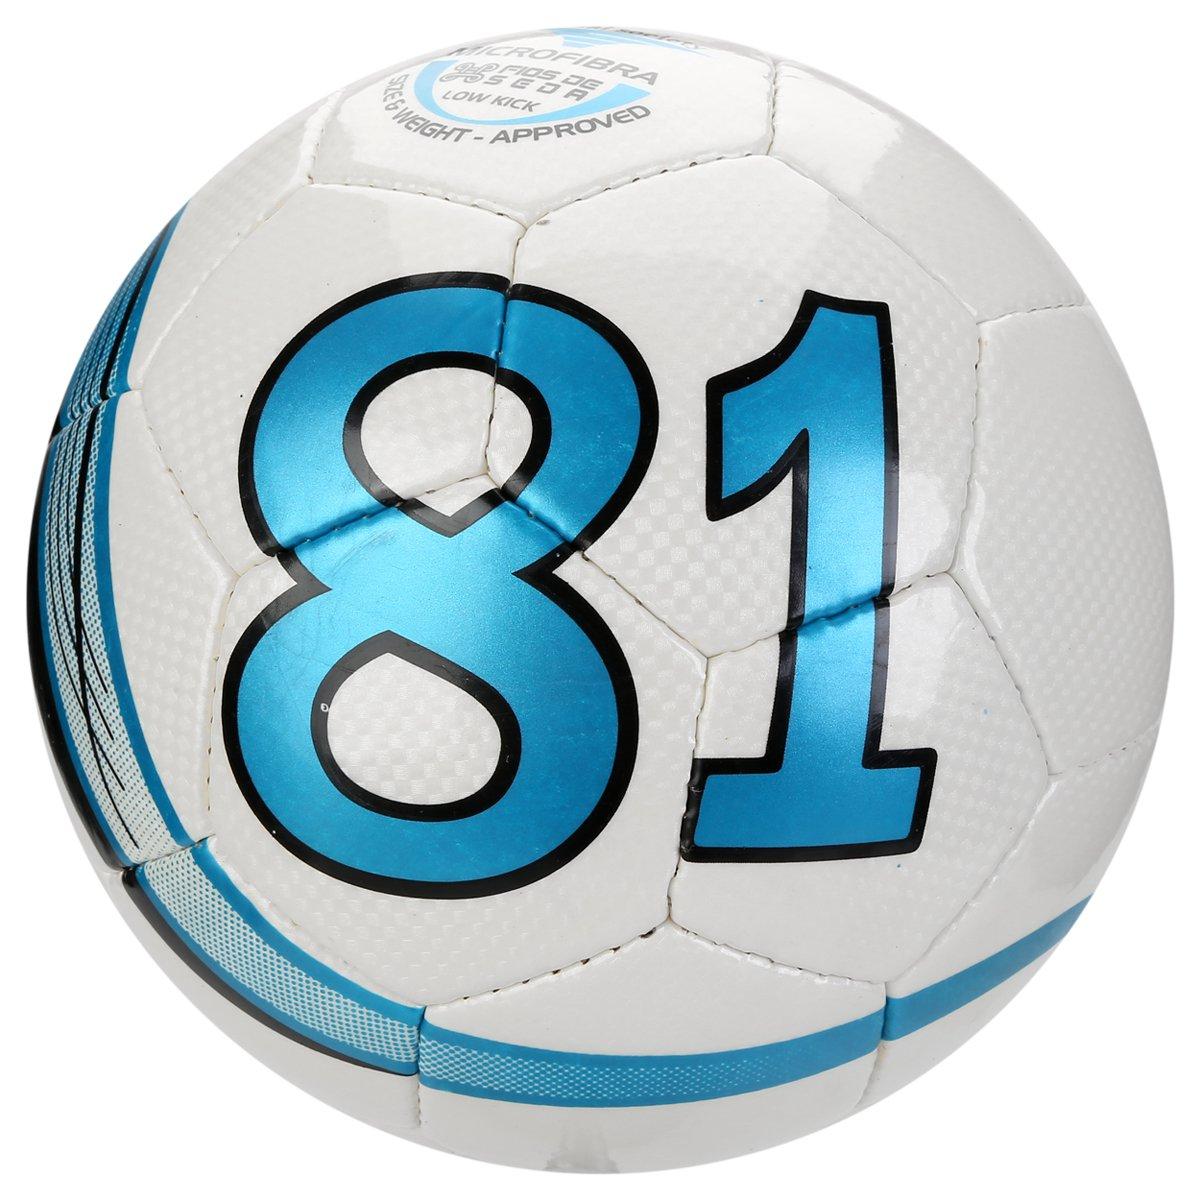 Bola Futebol Since 81 Celebration Colors Society - Compre Agora ... 84afc773c4729